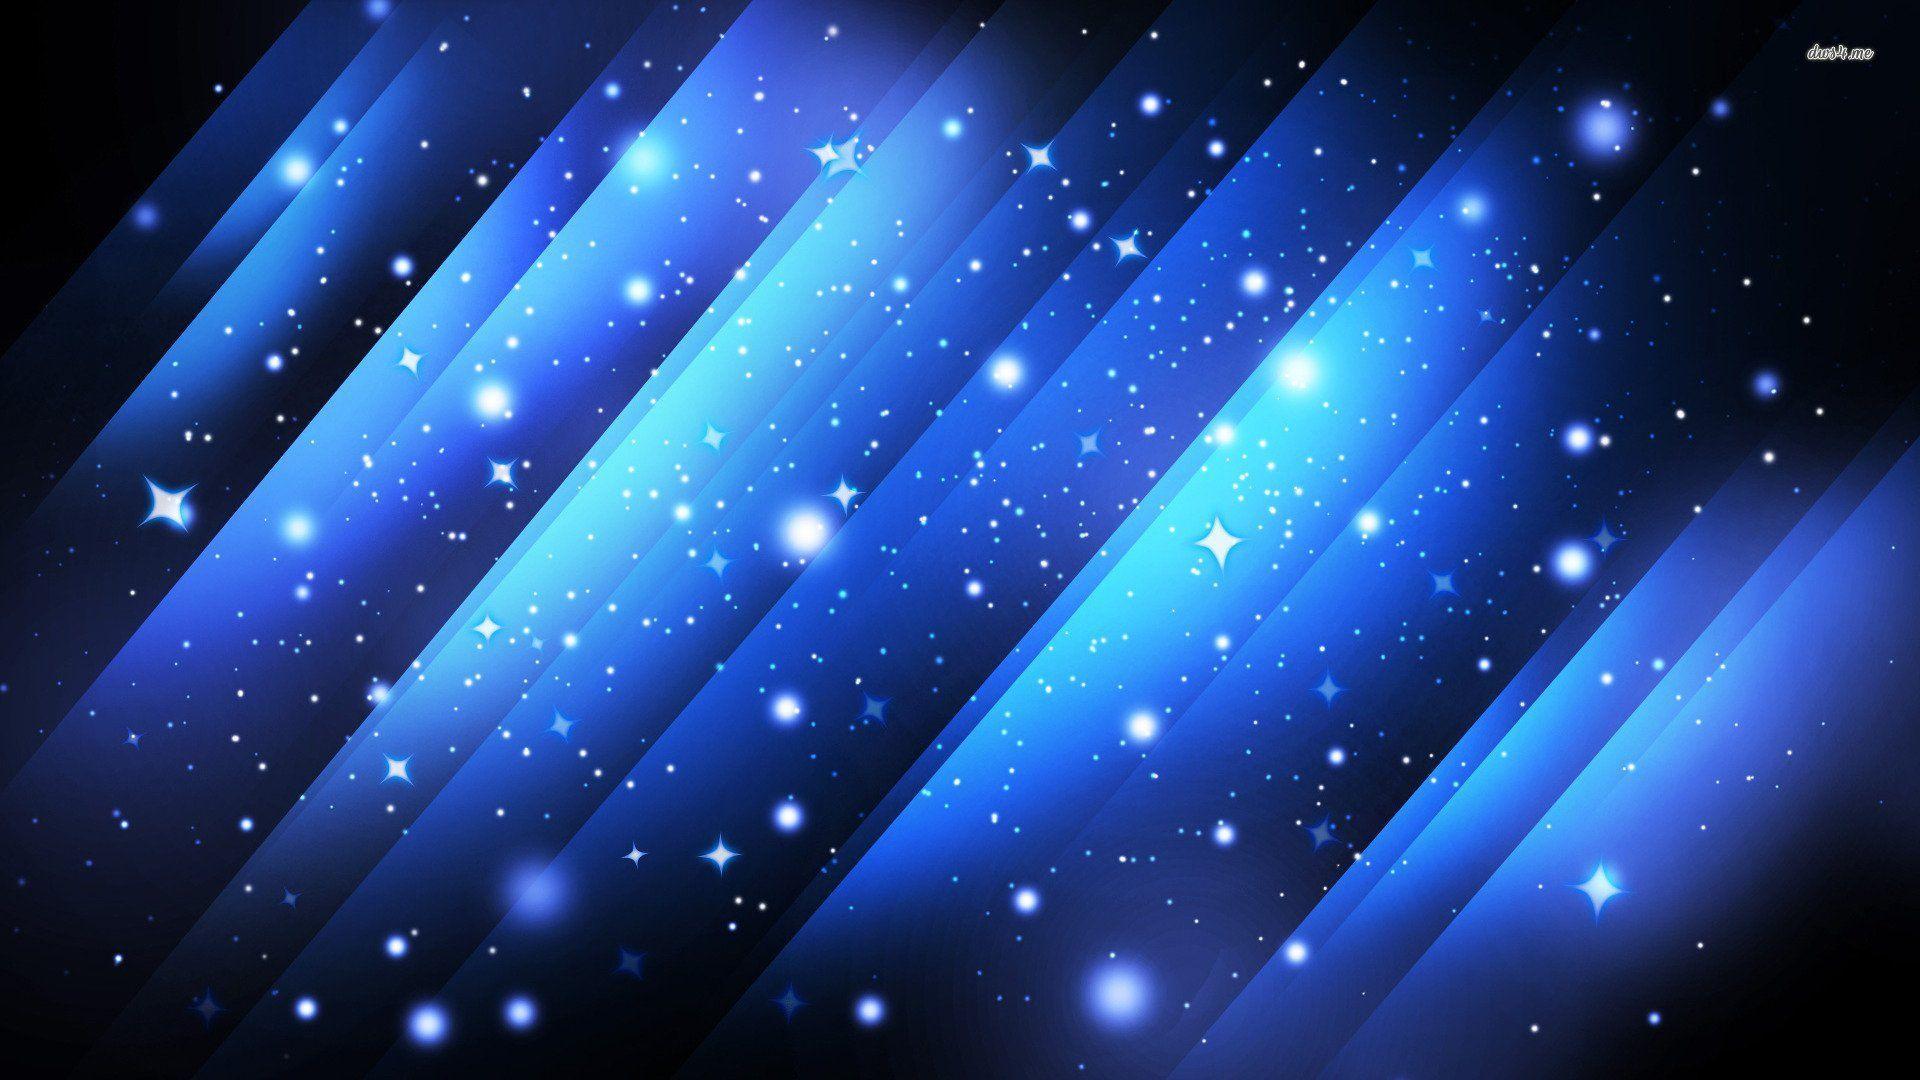 Light Particles Wallpaper 878908 - WallDevil